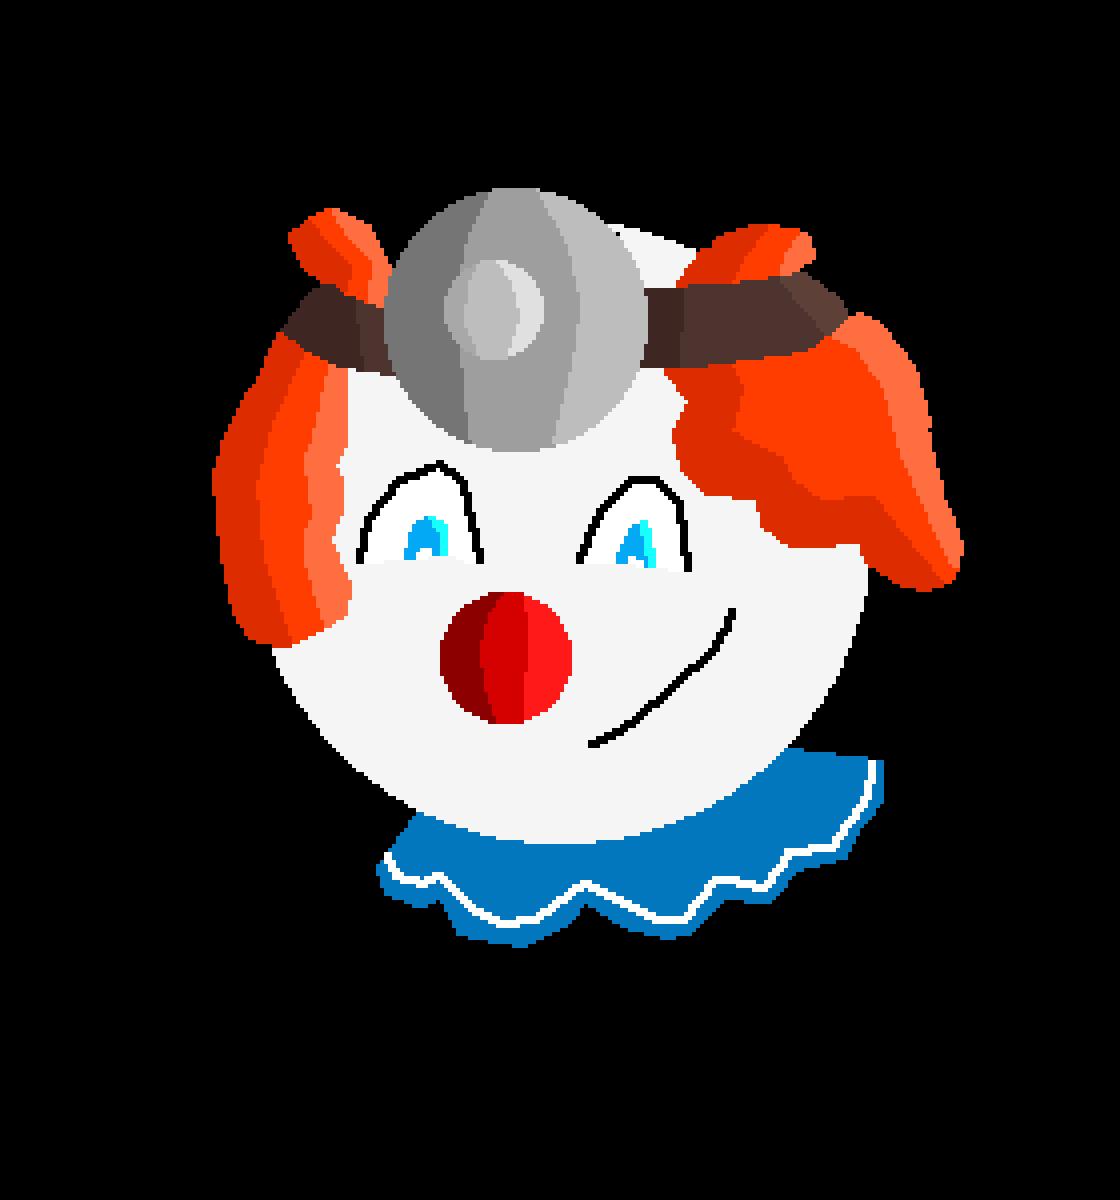 G0z the clown